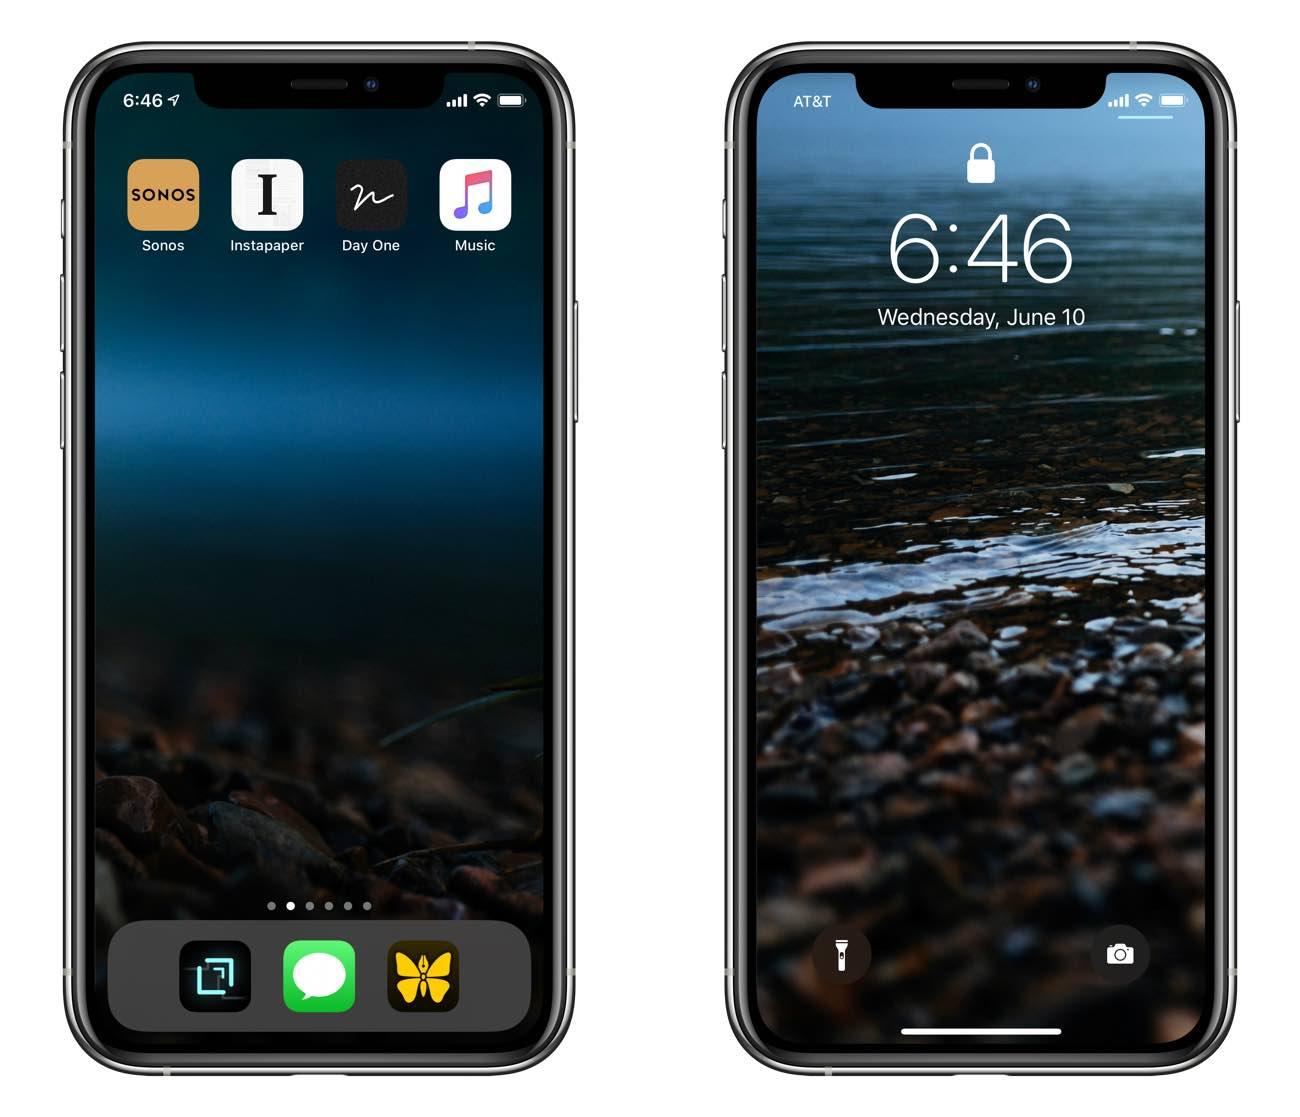 Shawn Blanc's iPhone Home Screen, circa June 2020